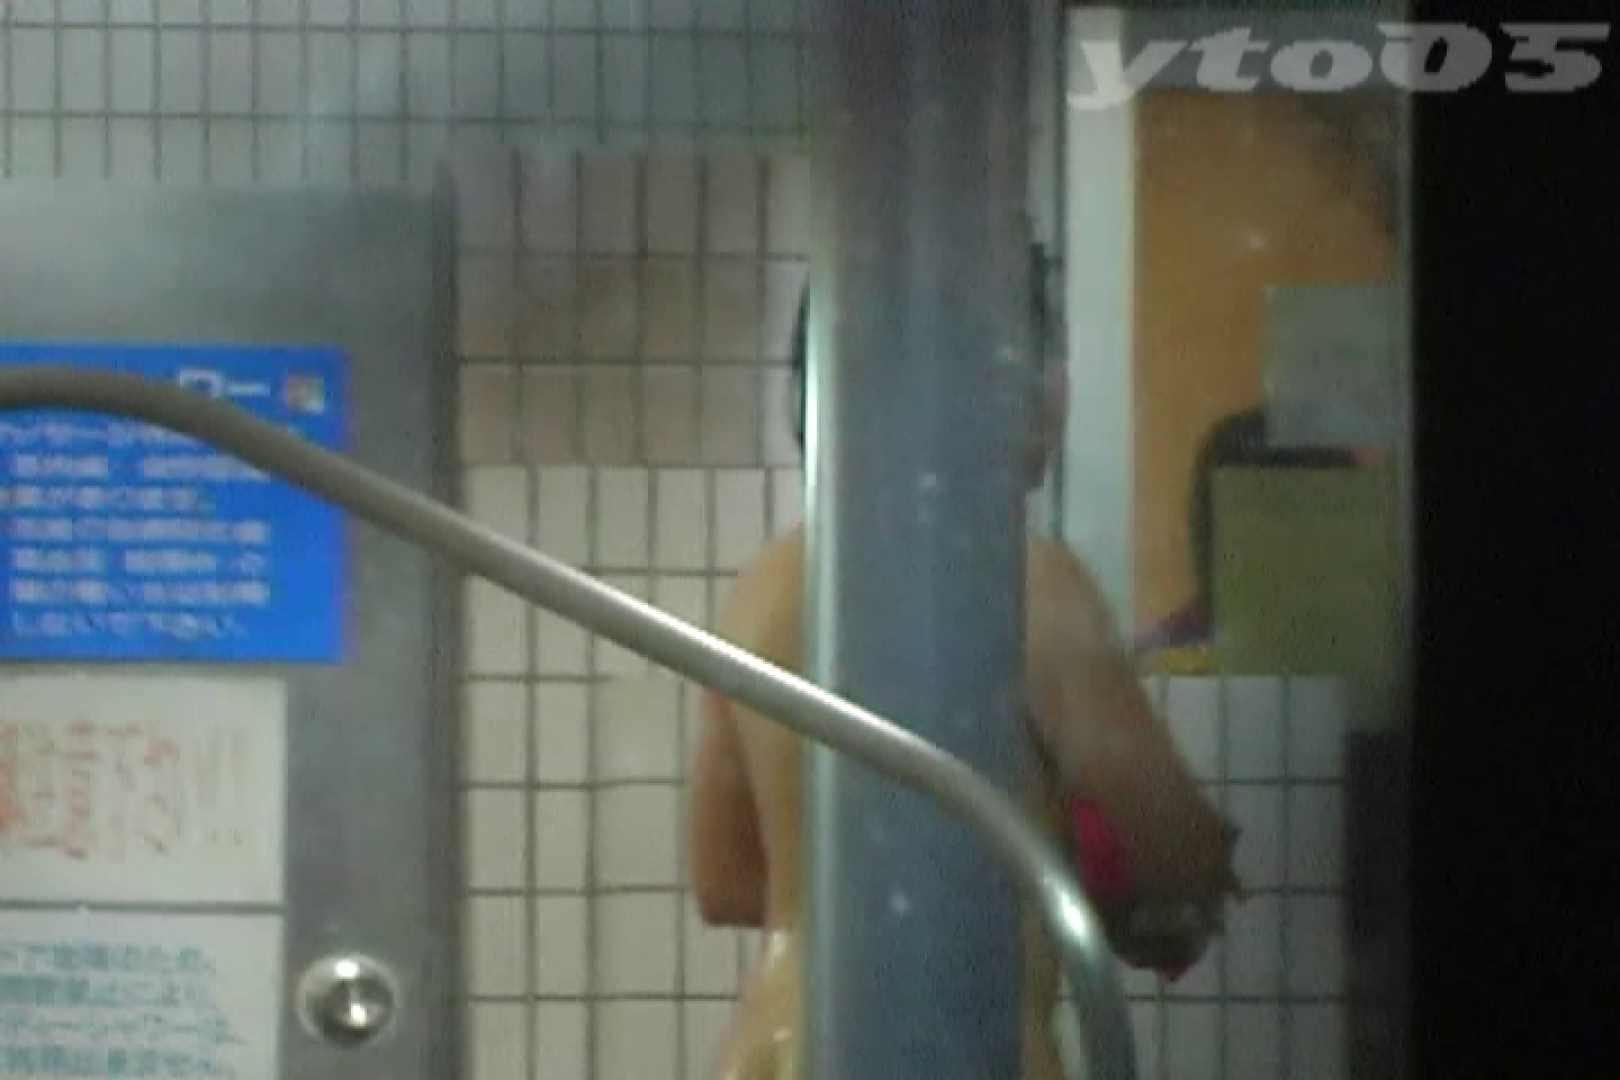 ▲復活限定▲合宿ホテル女風呂盗撮 Vol.31 盗撮で悶絶   女湯  94画像 65